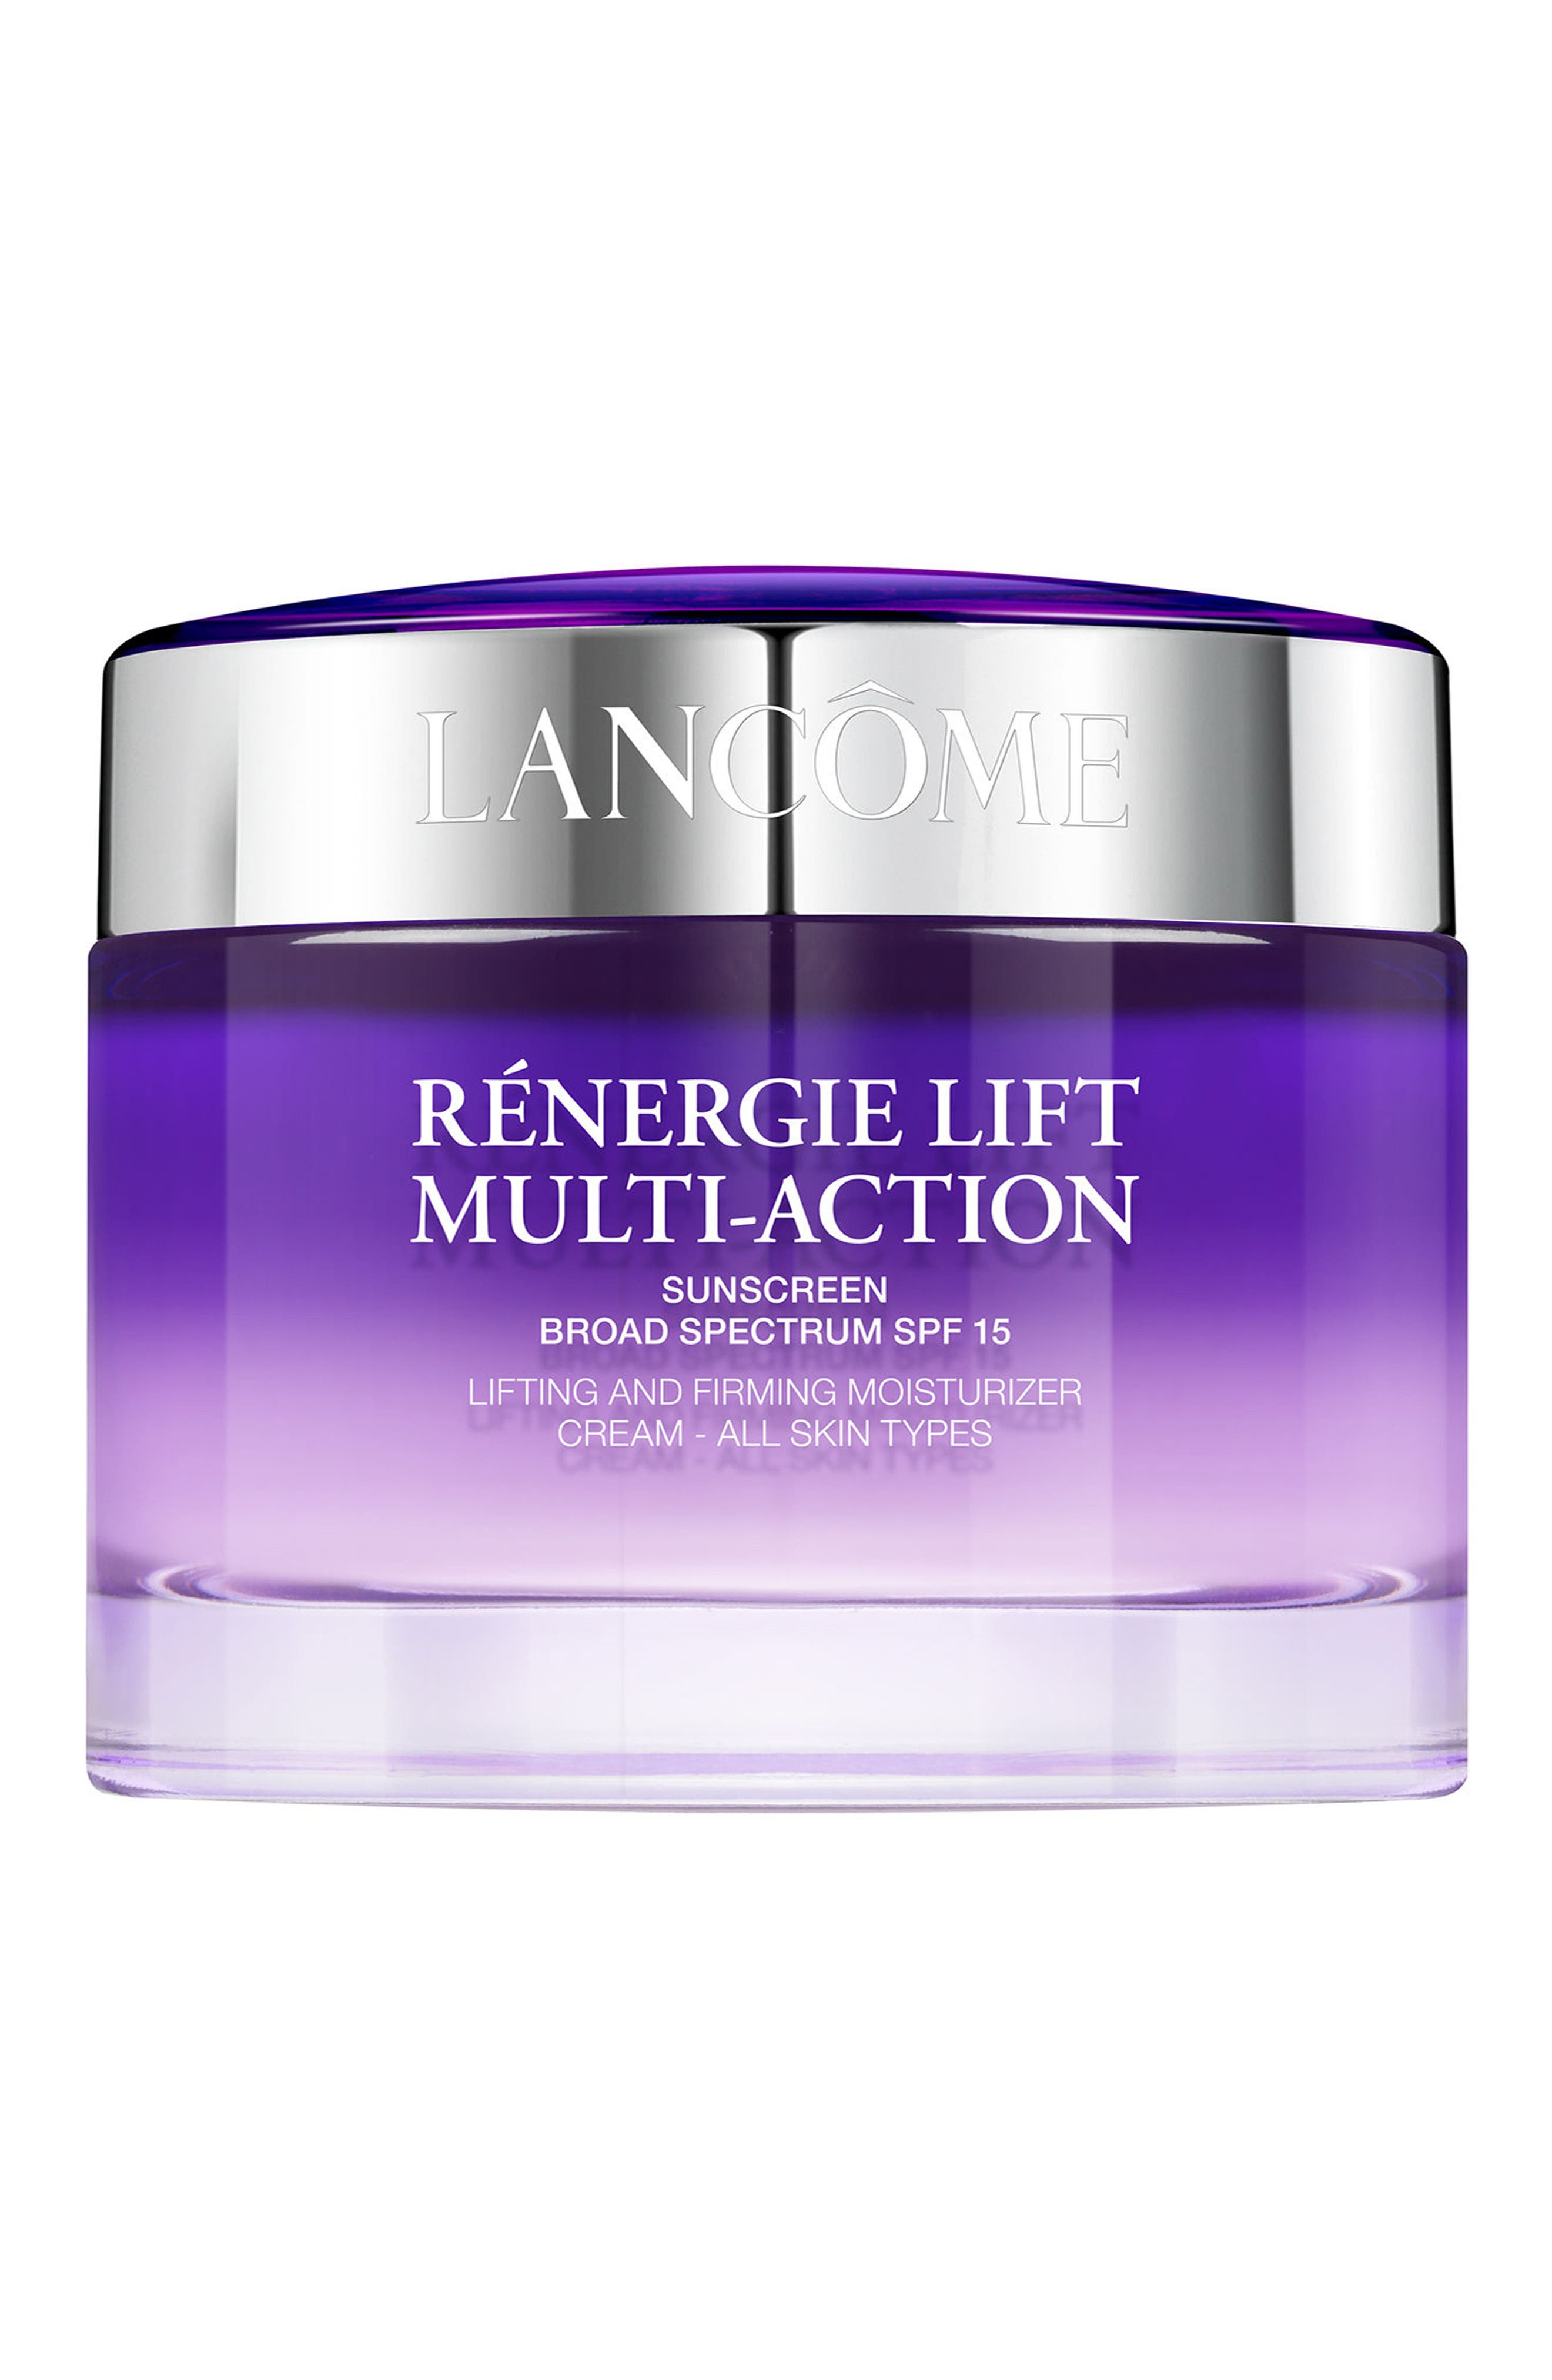 LANCÔME Rénergie Lift Multi Action Moisturizer Cream SPF 15 for All Skin Types, Main, color, NO COLOR